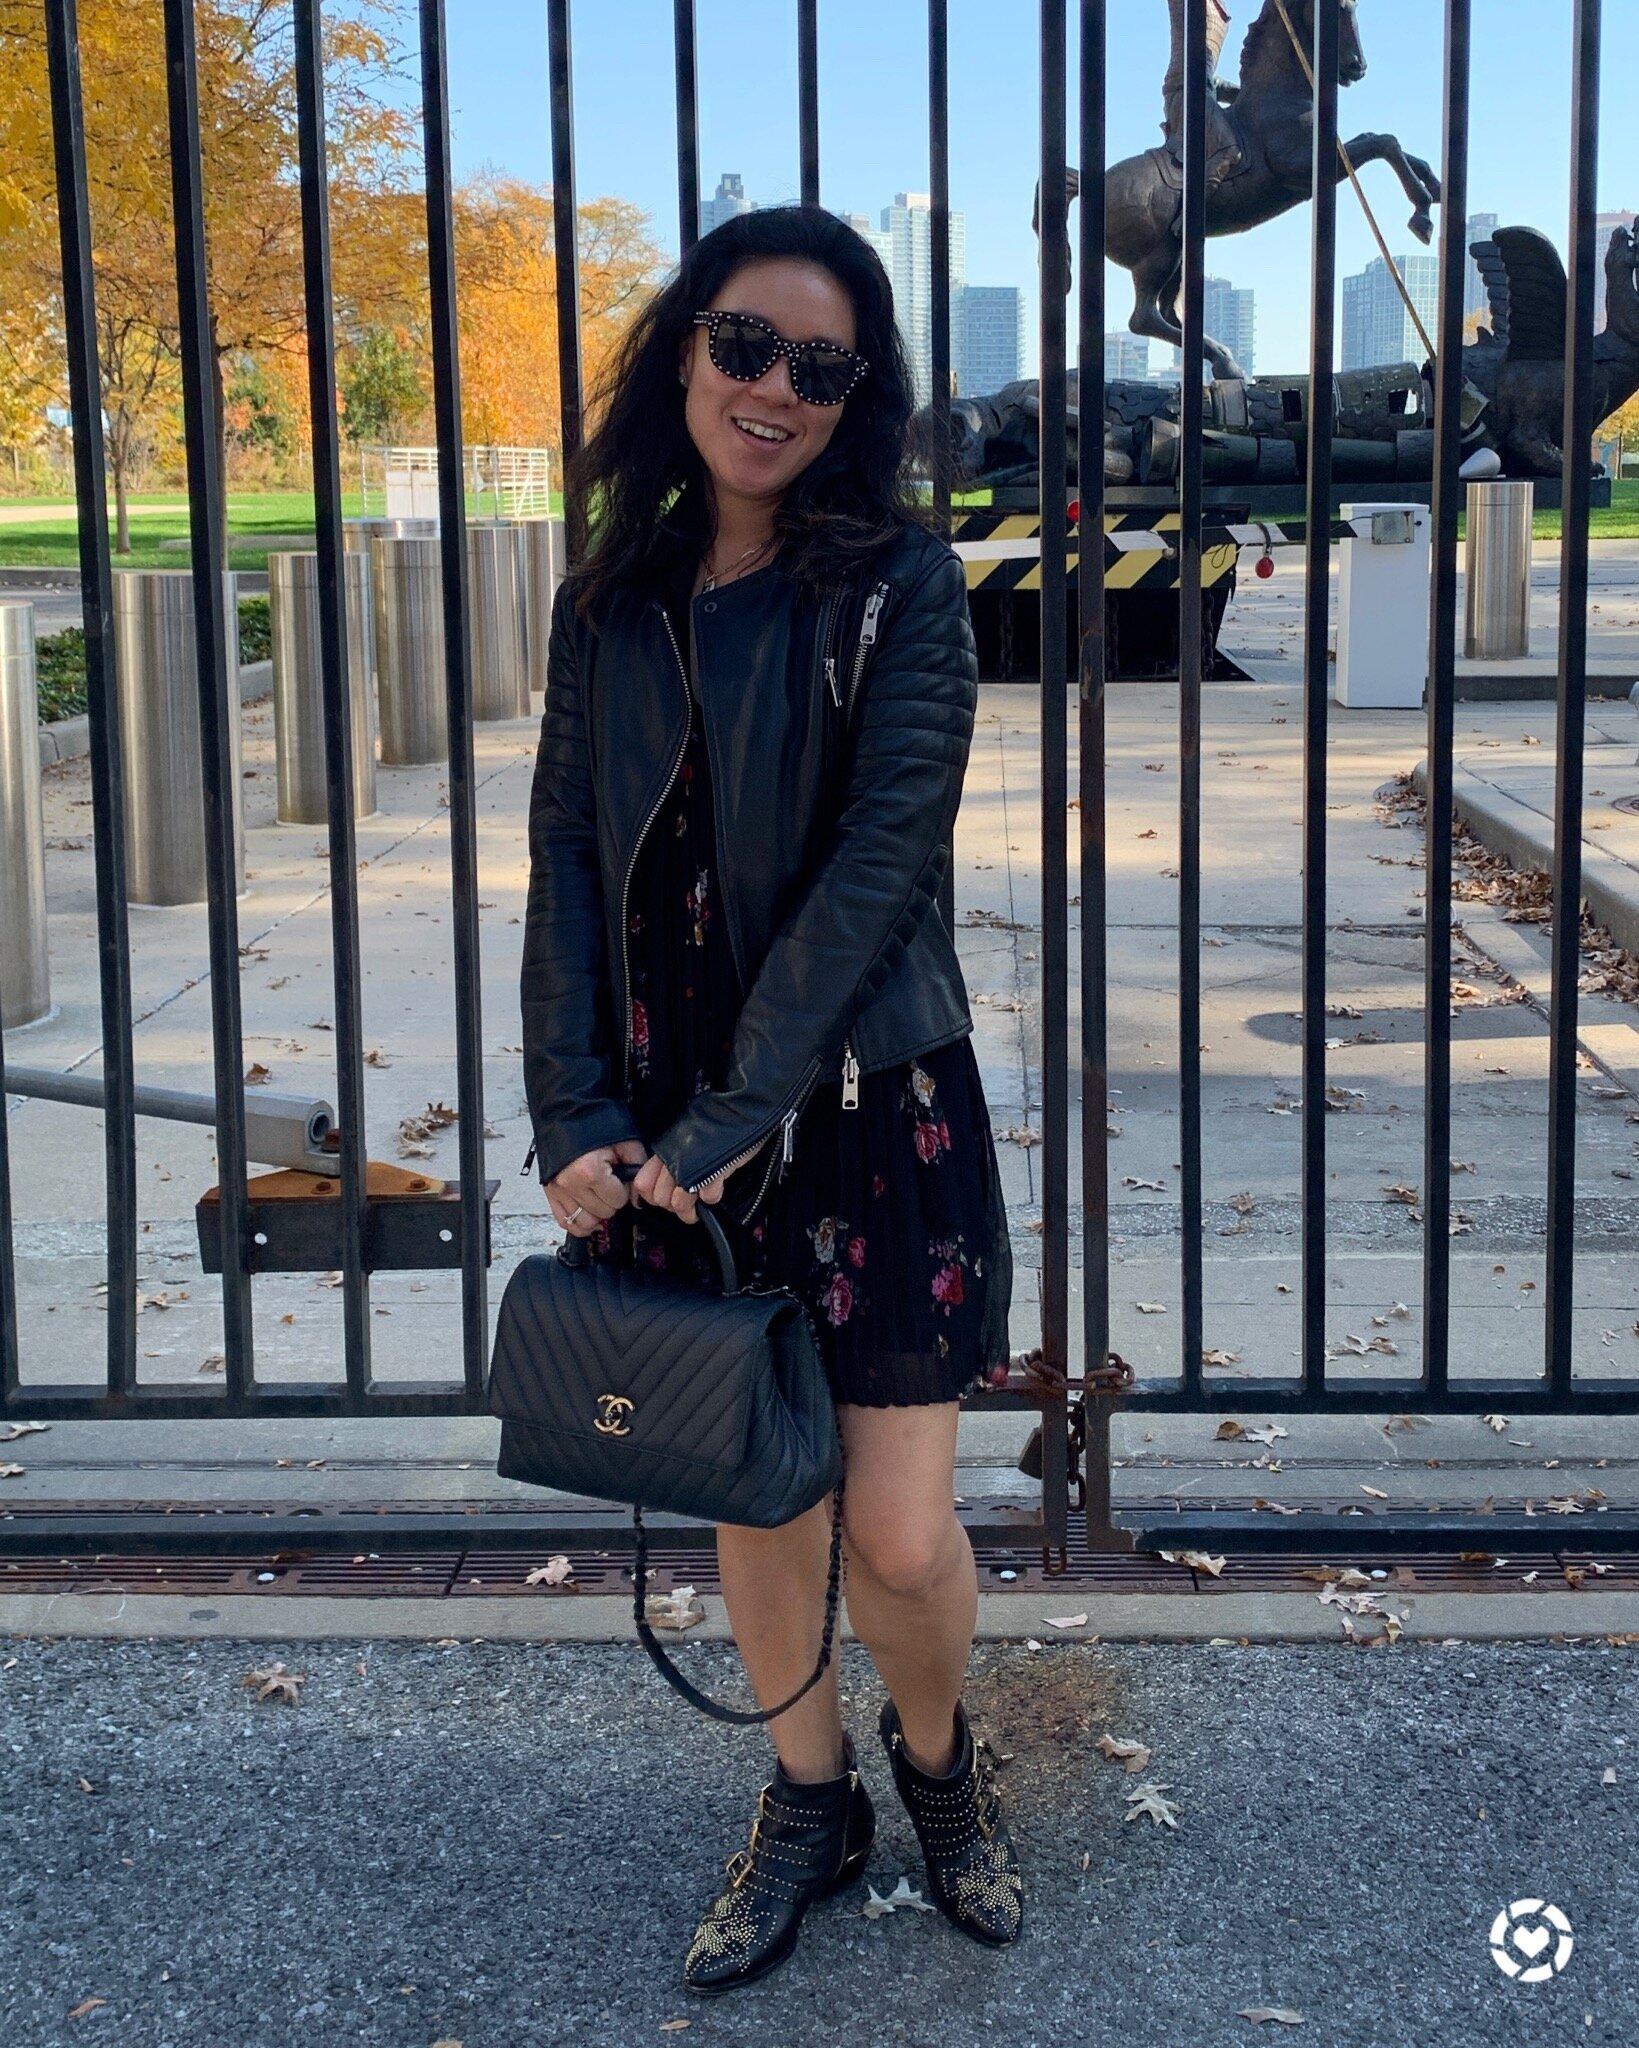 amy-leather-jacket-dress.JPG